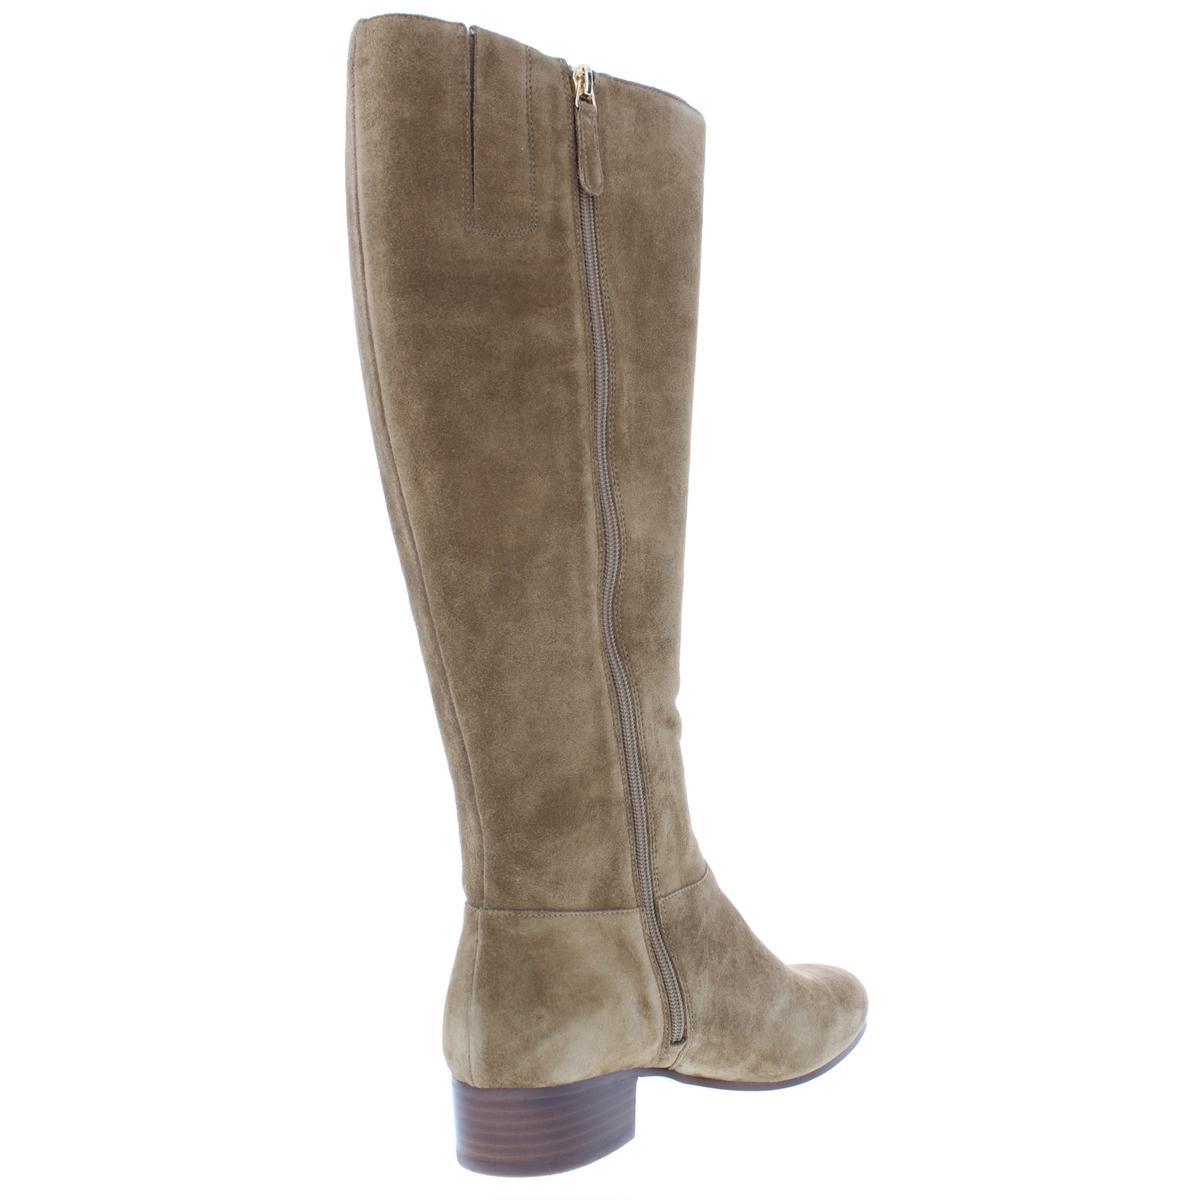 Nine West Women/'s Oreyan Knee High Boot